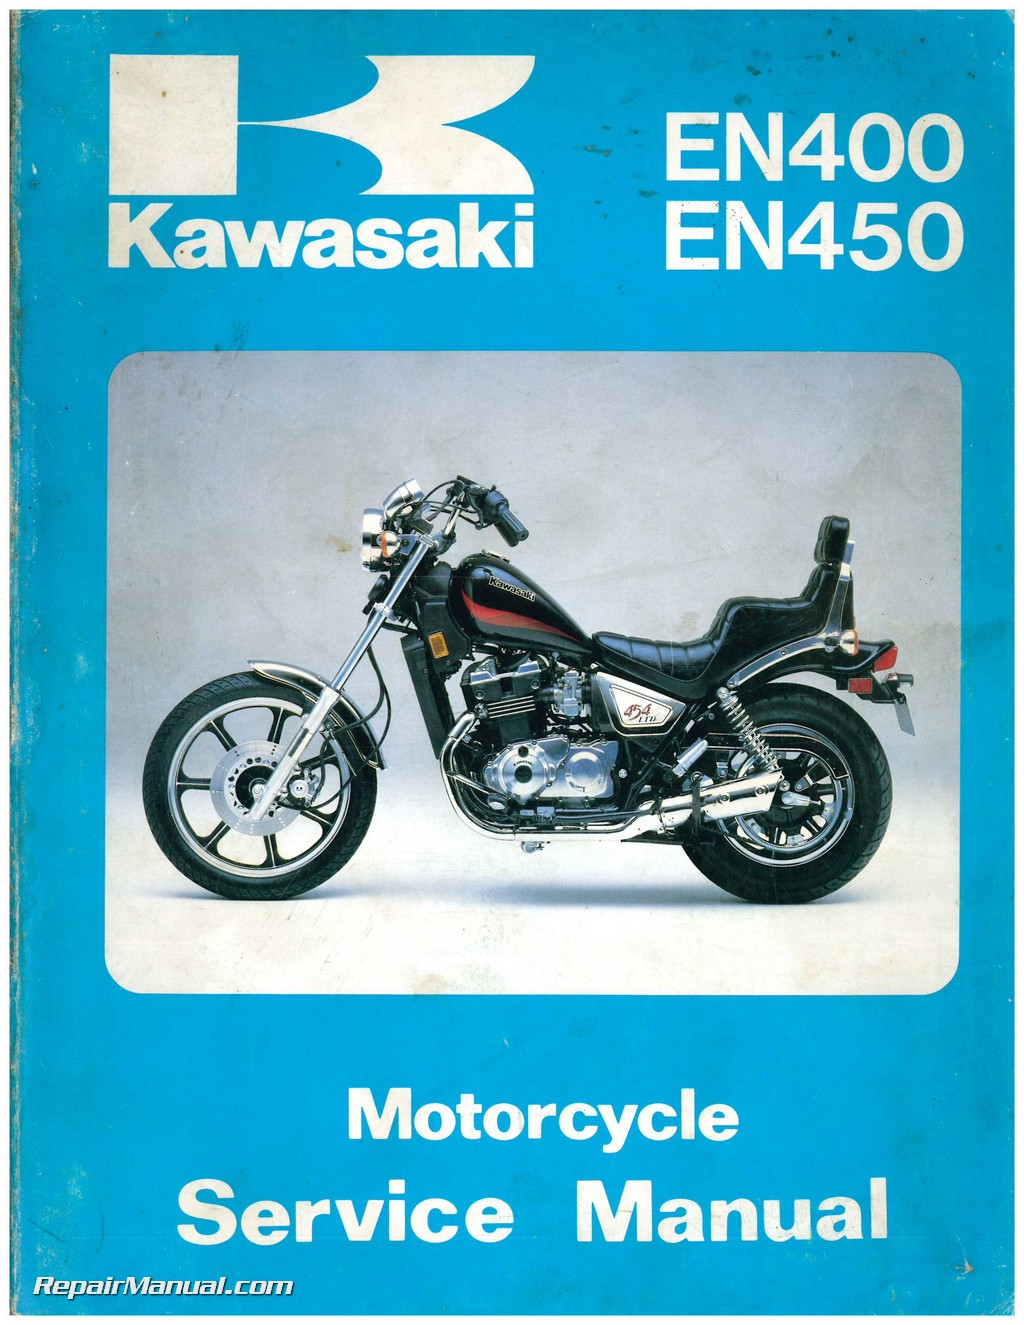 used 1985 1990 kawasaki en400 en450 en500 ex500 motorcycle service rh repairmanual com 09 En500 LTD vulcan en 500 service manual